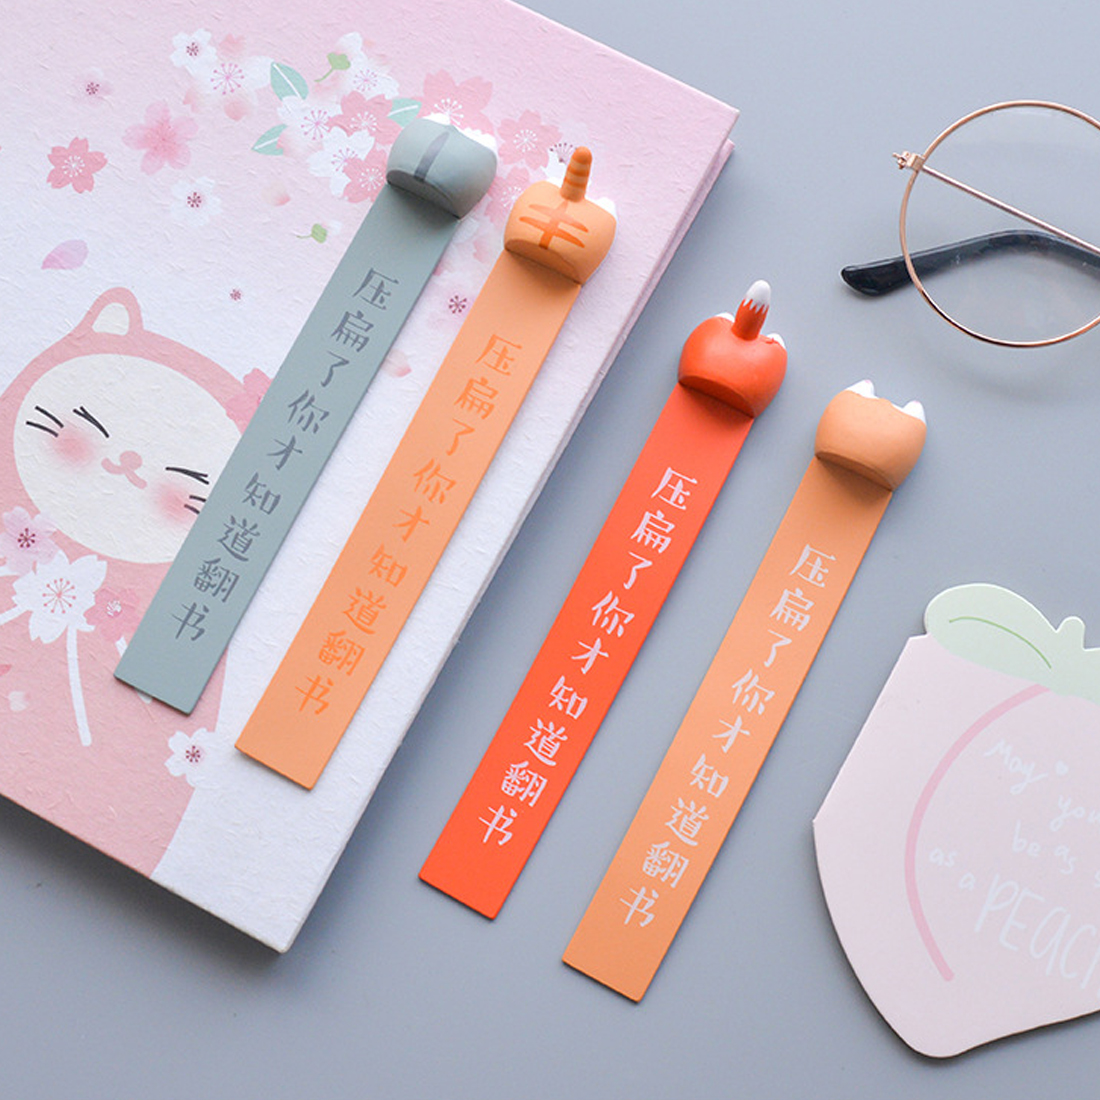 Cute Animal Ass Bookmarks Fox Corgi Cat Hamster Novelty Book Reading Item Creative Teacher Gift School Accessories